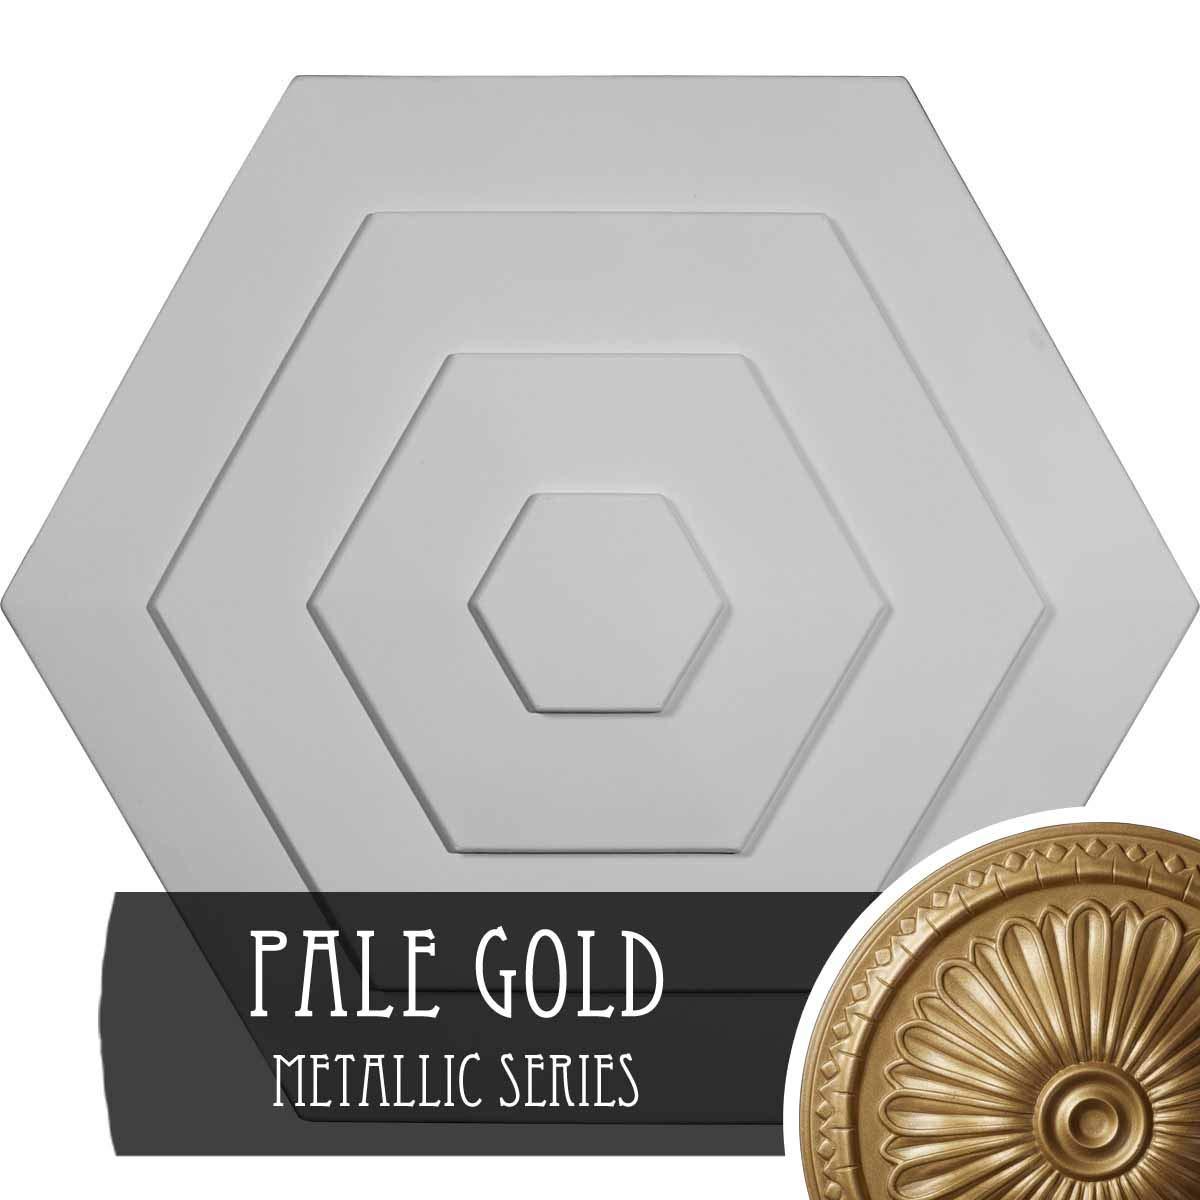 Ekena Millwork CM23WFPAS Woodruff Ceiling Medallion, 23-1/4'' x 7/8'', Pale Gold